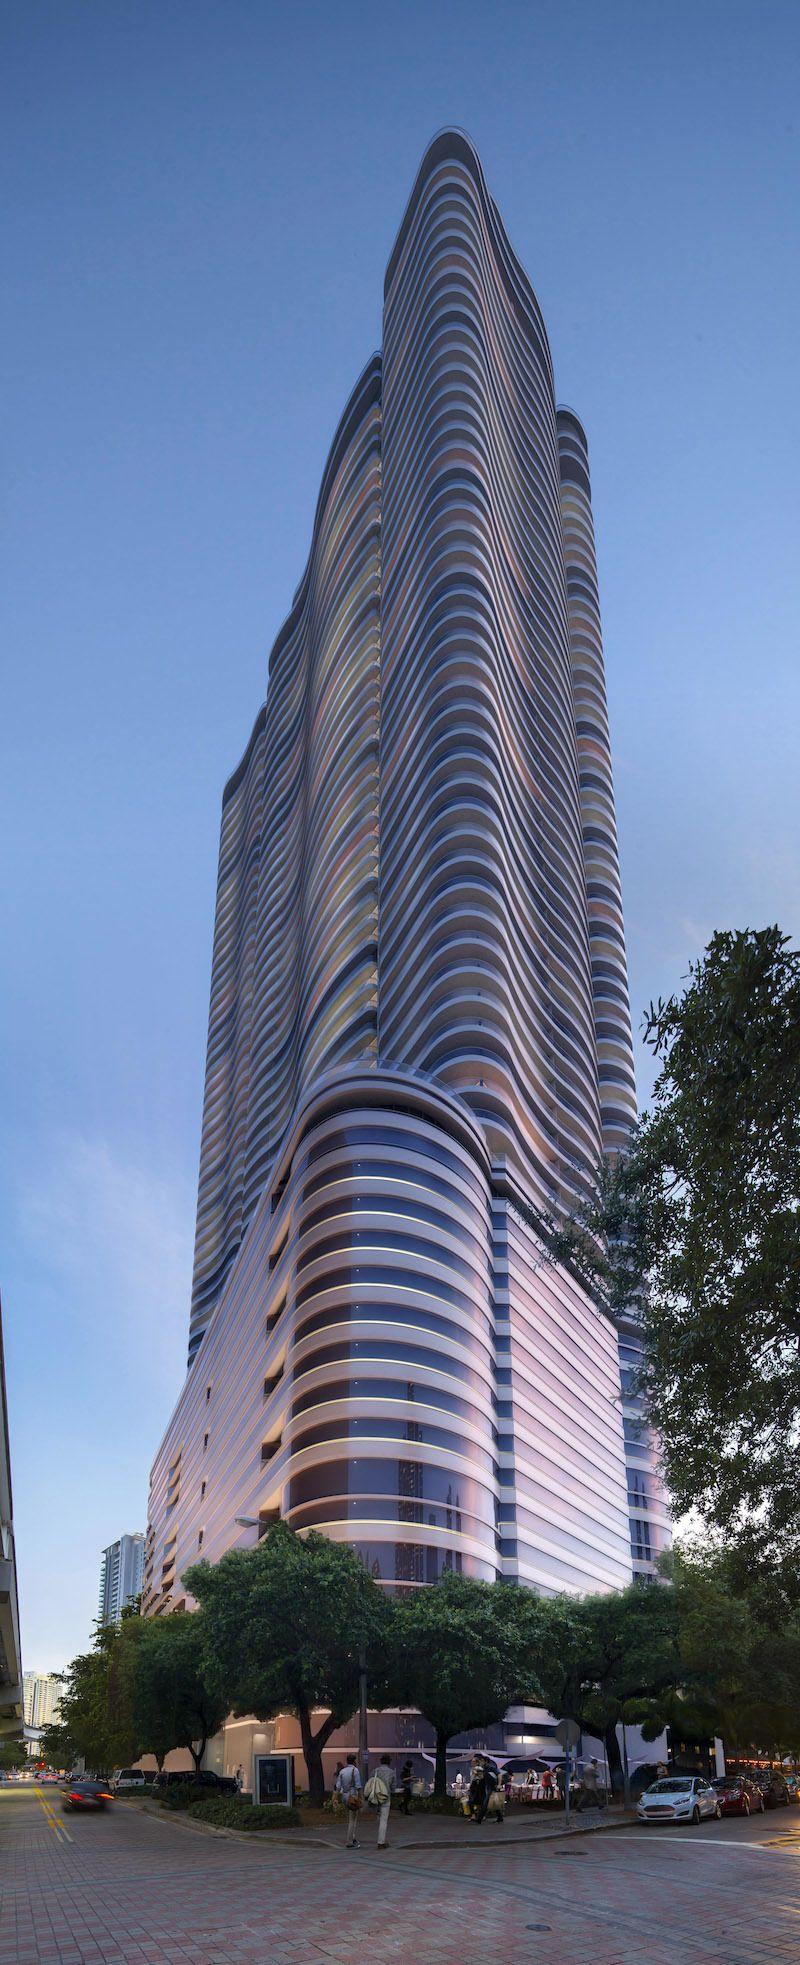 Brickell Flatiron Investinmiami Com Brickell Flatiron Architecture Details Luxury Condo